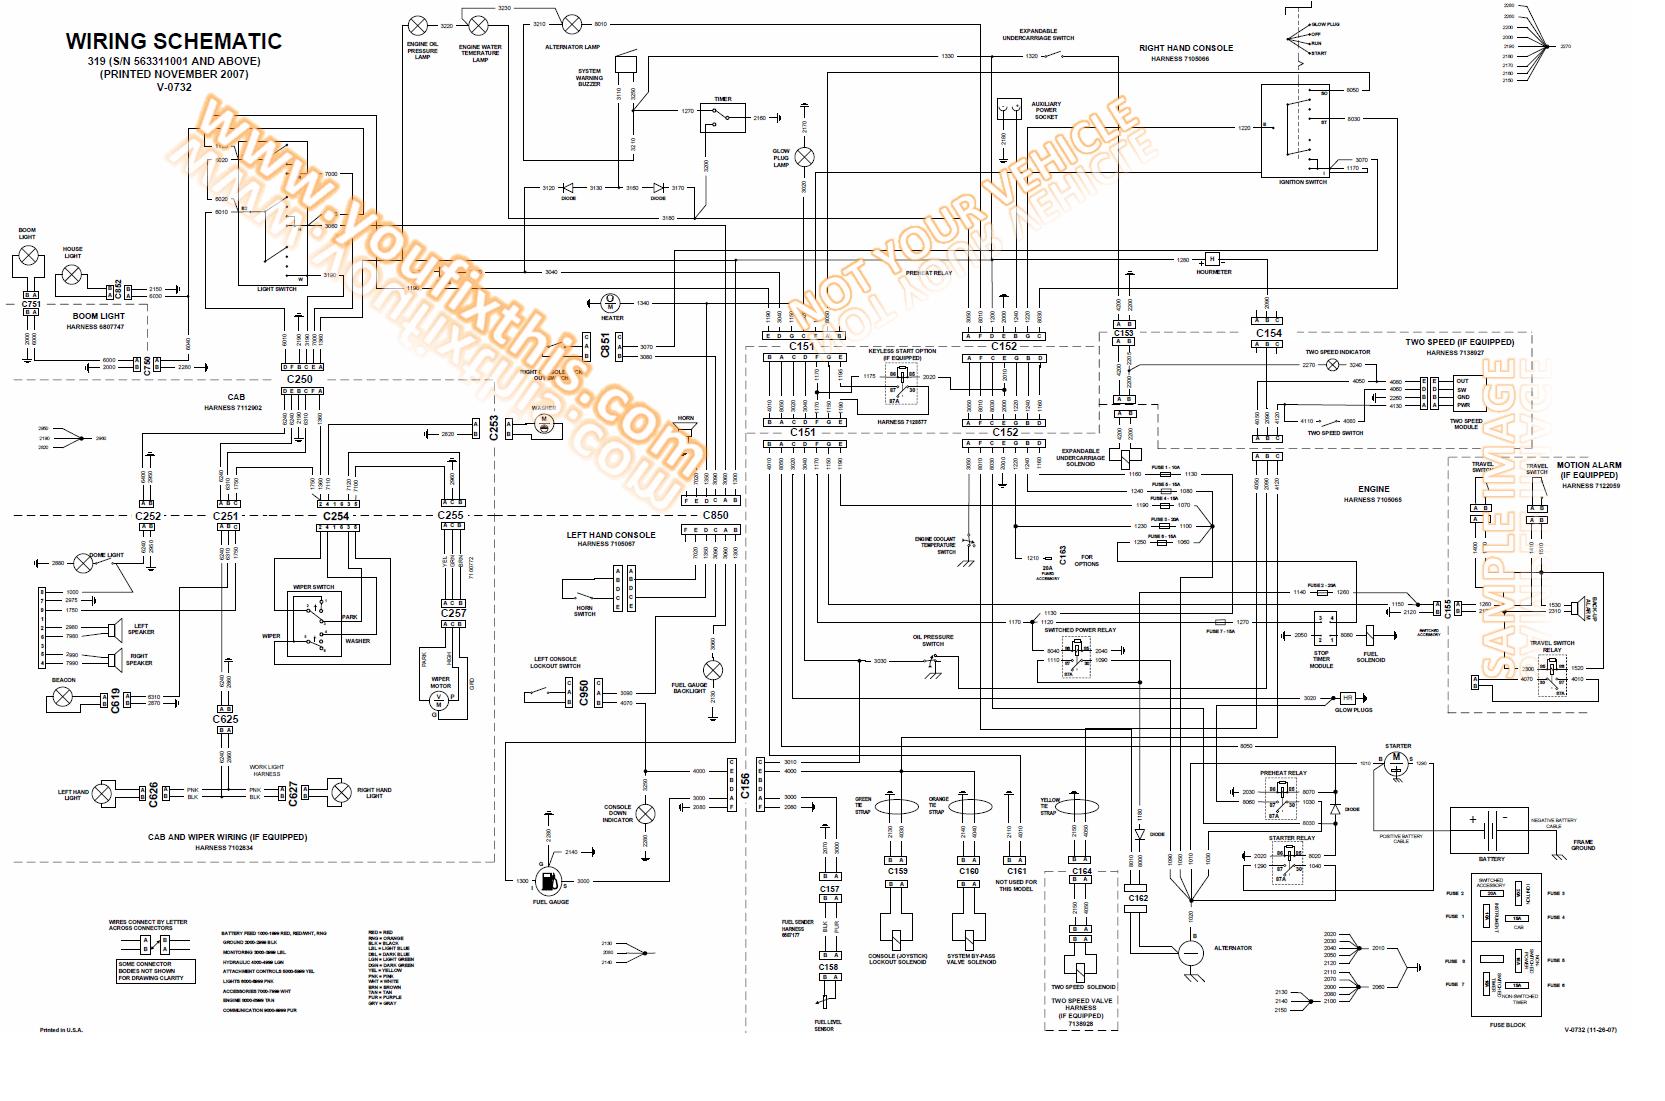 john deere 210 wiring harness wiring diagram weick Restaurant Wiring Diagram godown wiring diagram download